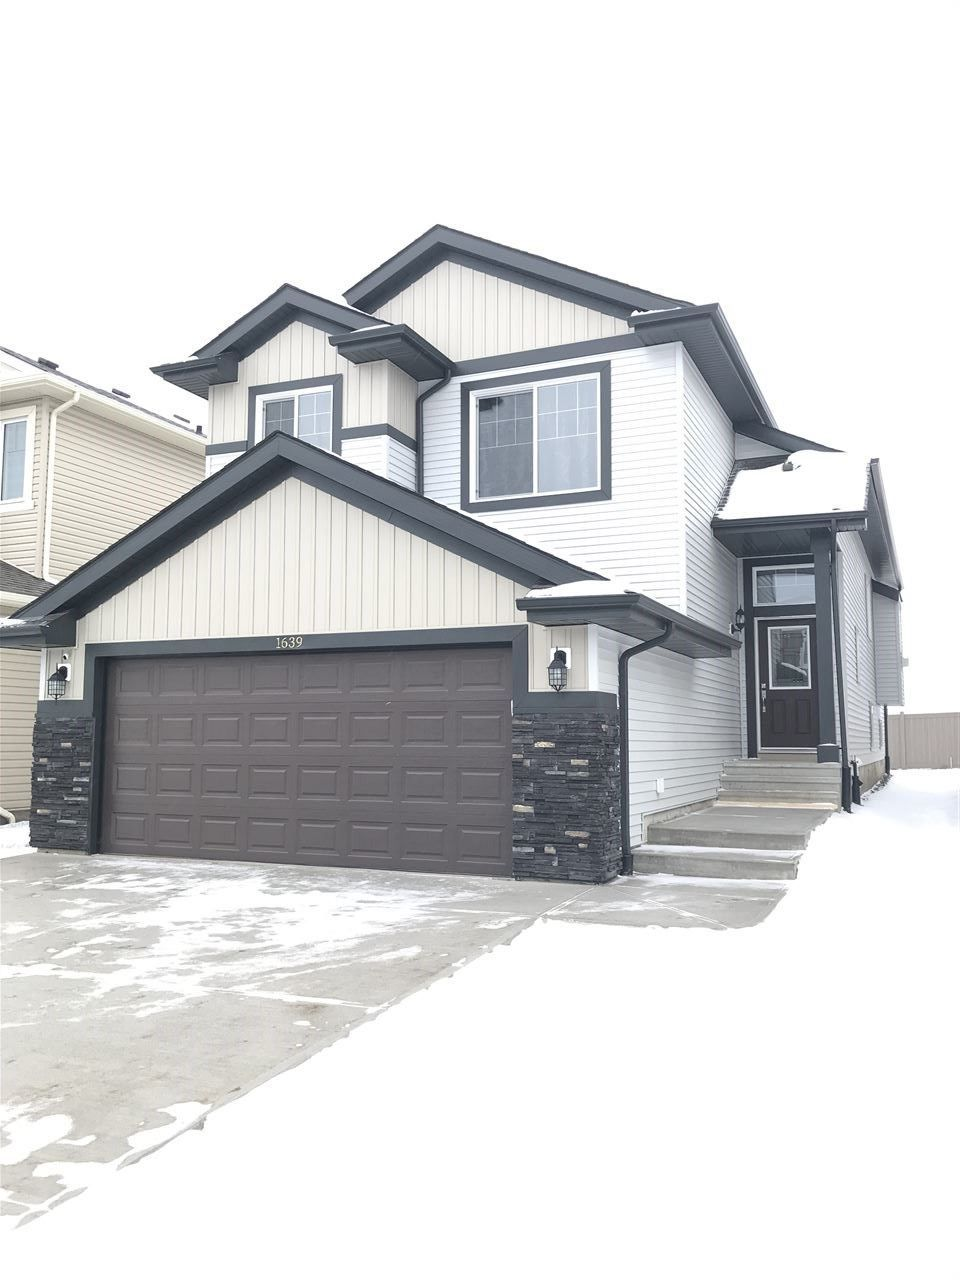 Main Photo: 1639 18 Street in Edmonton: Zone 30 House for sale : MLS®# E4135622